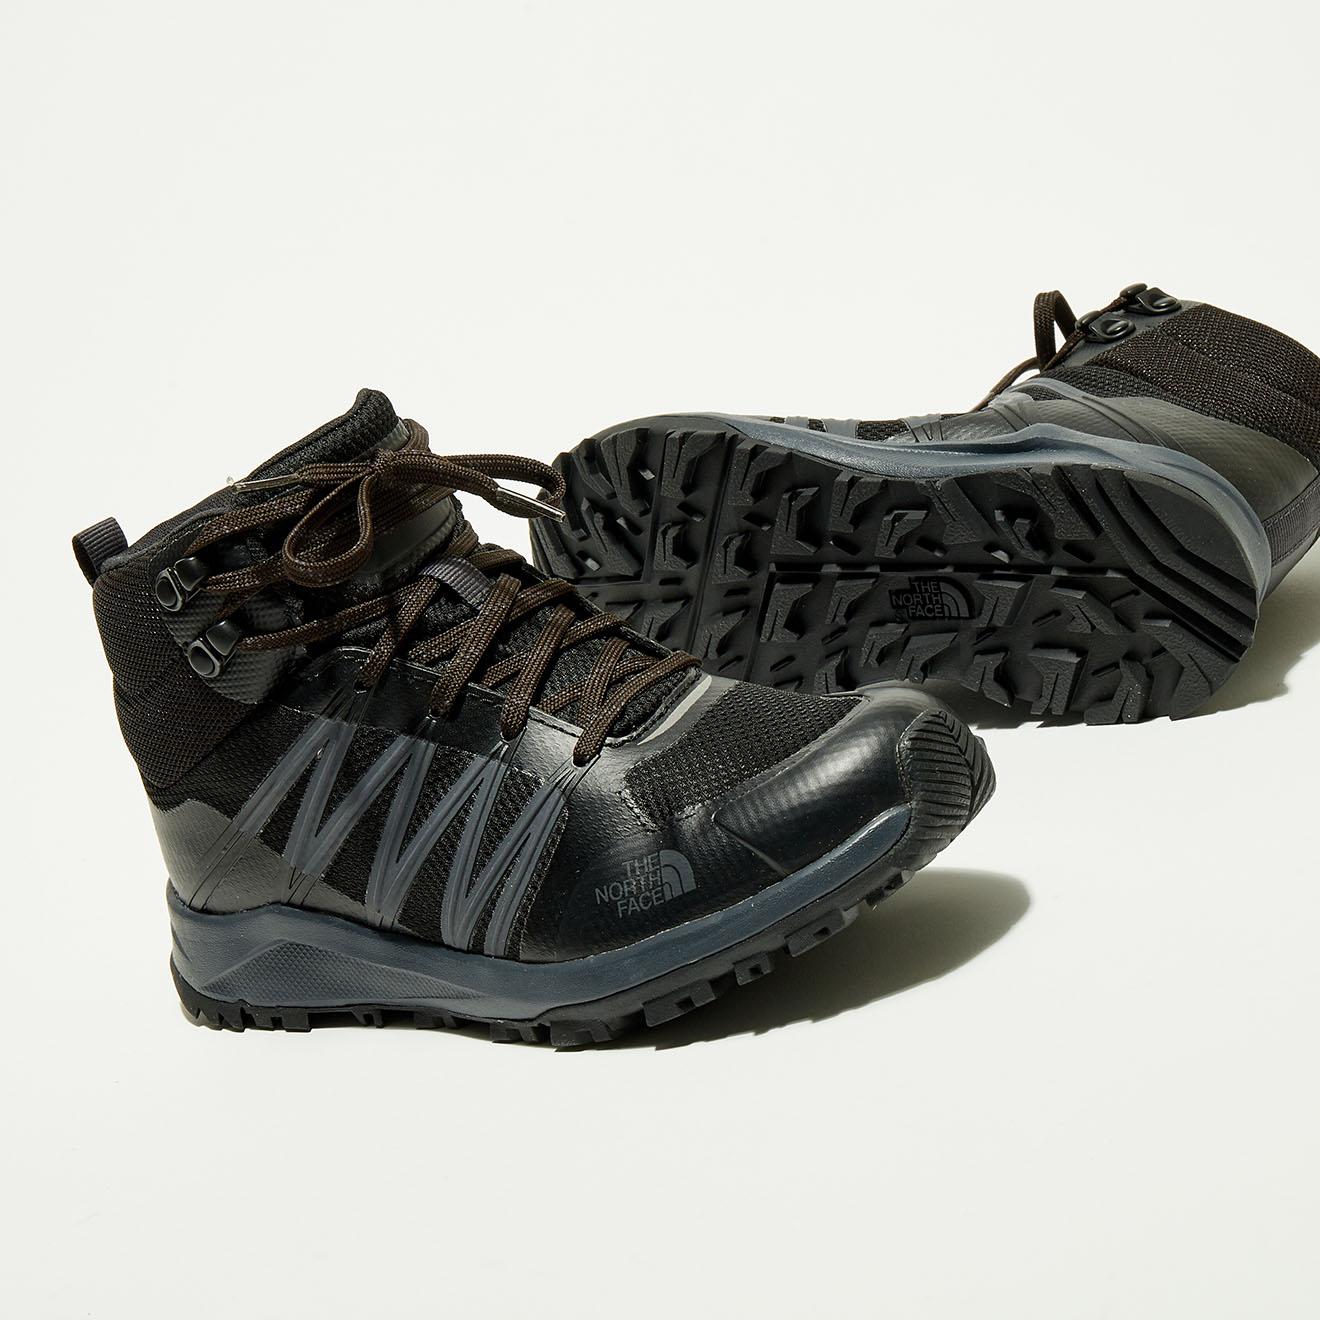 Sneakers trekking Litewave Tracker GTX - The North Face - Modalova